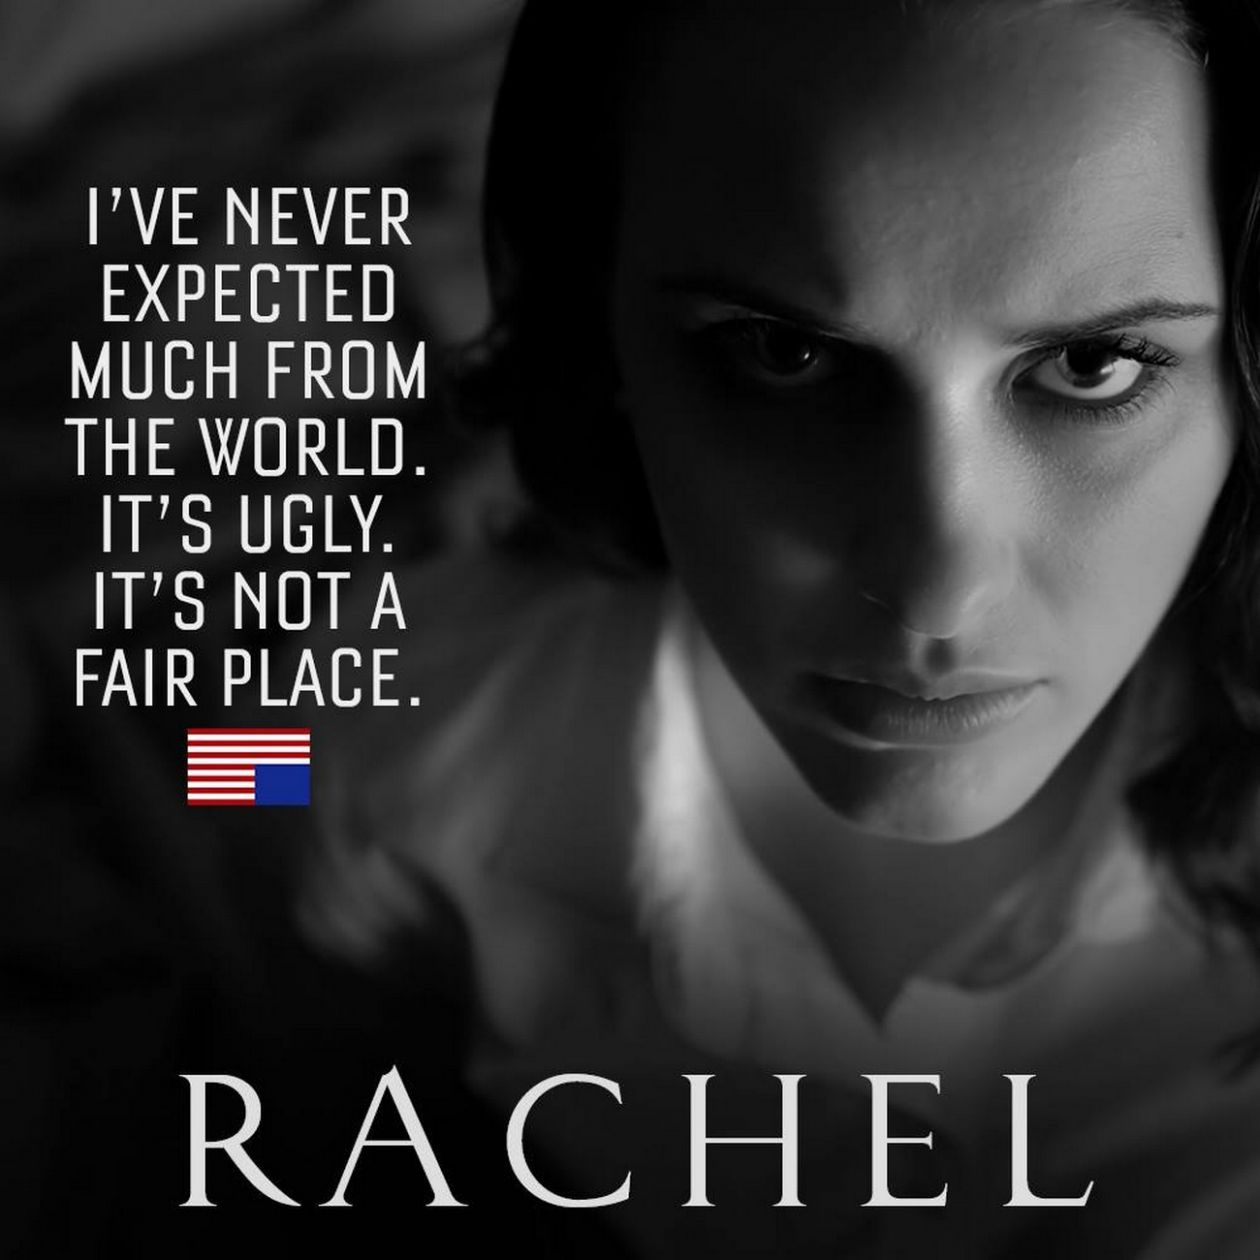 Rachel Brosnahan | House of Cards : Rachel Posner | NETFLIX 2013 - 2014 - 2015